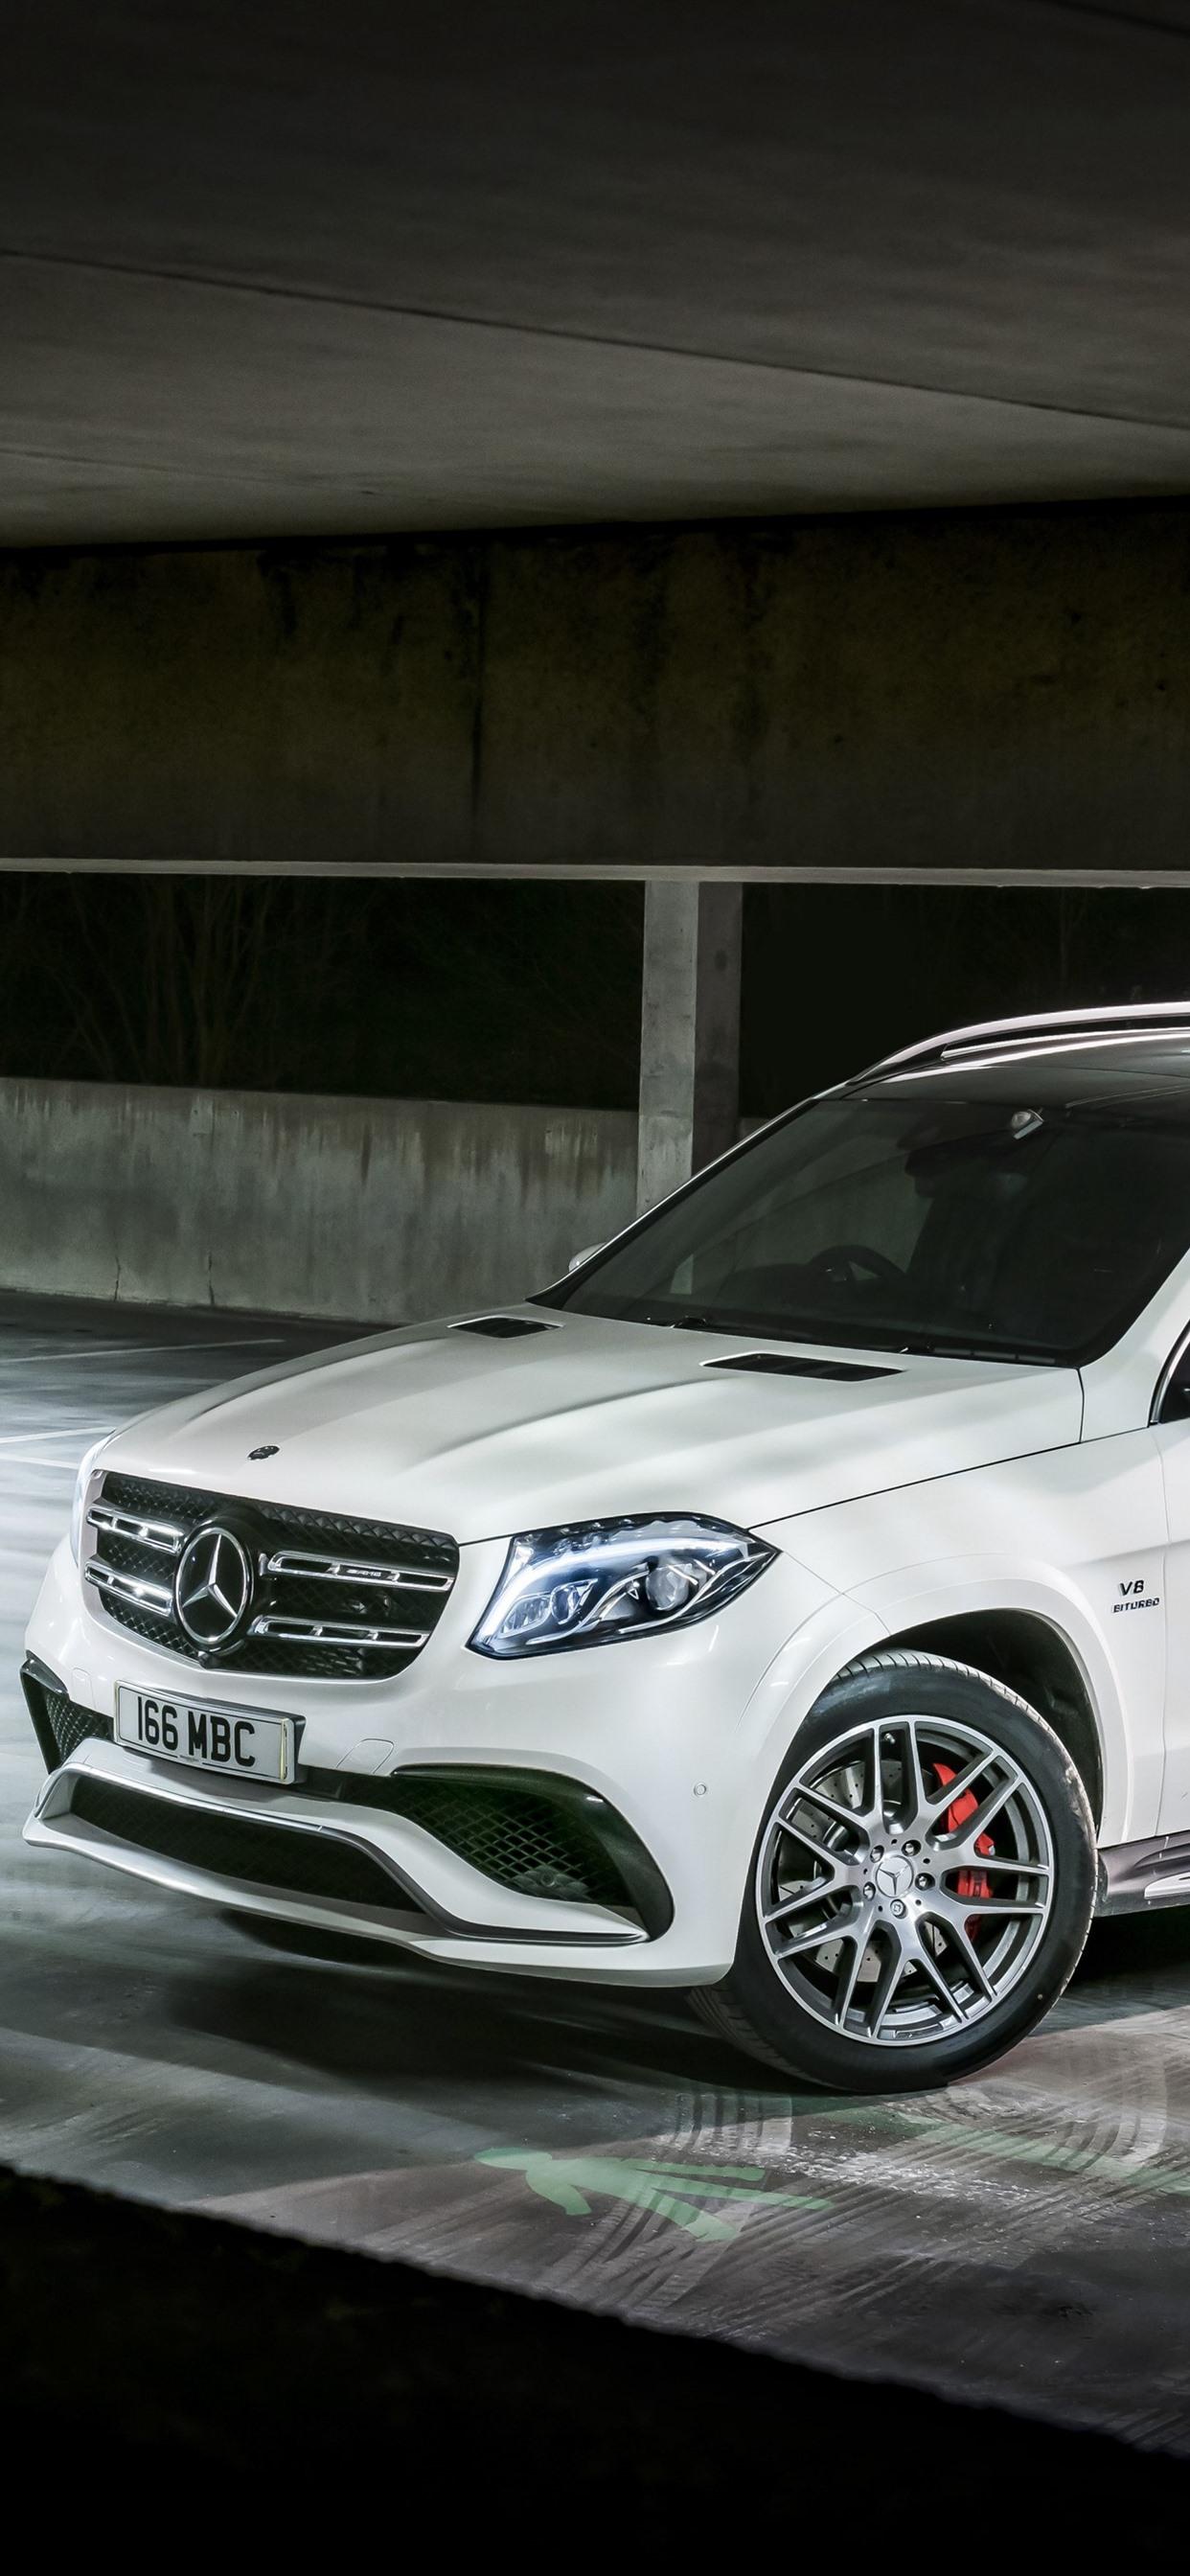 Mercedes Benz Amg X166 Suv Blanco 1242x2688 Iphone Xs Max